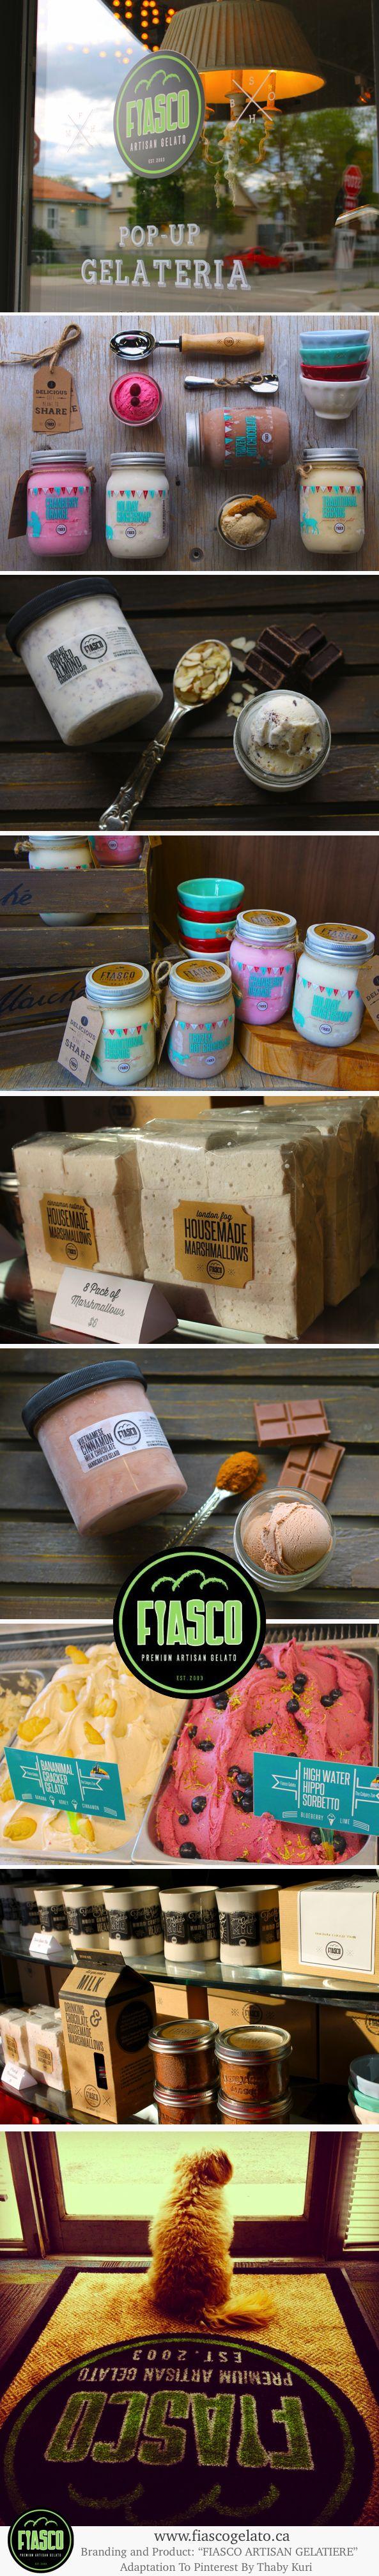 FIASCO / PRODUCT AND BRANDING Premium Artisan Gelatiere. #branding #packaging PD